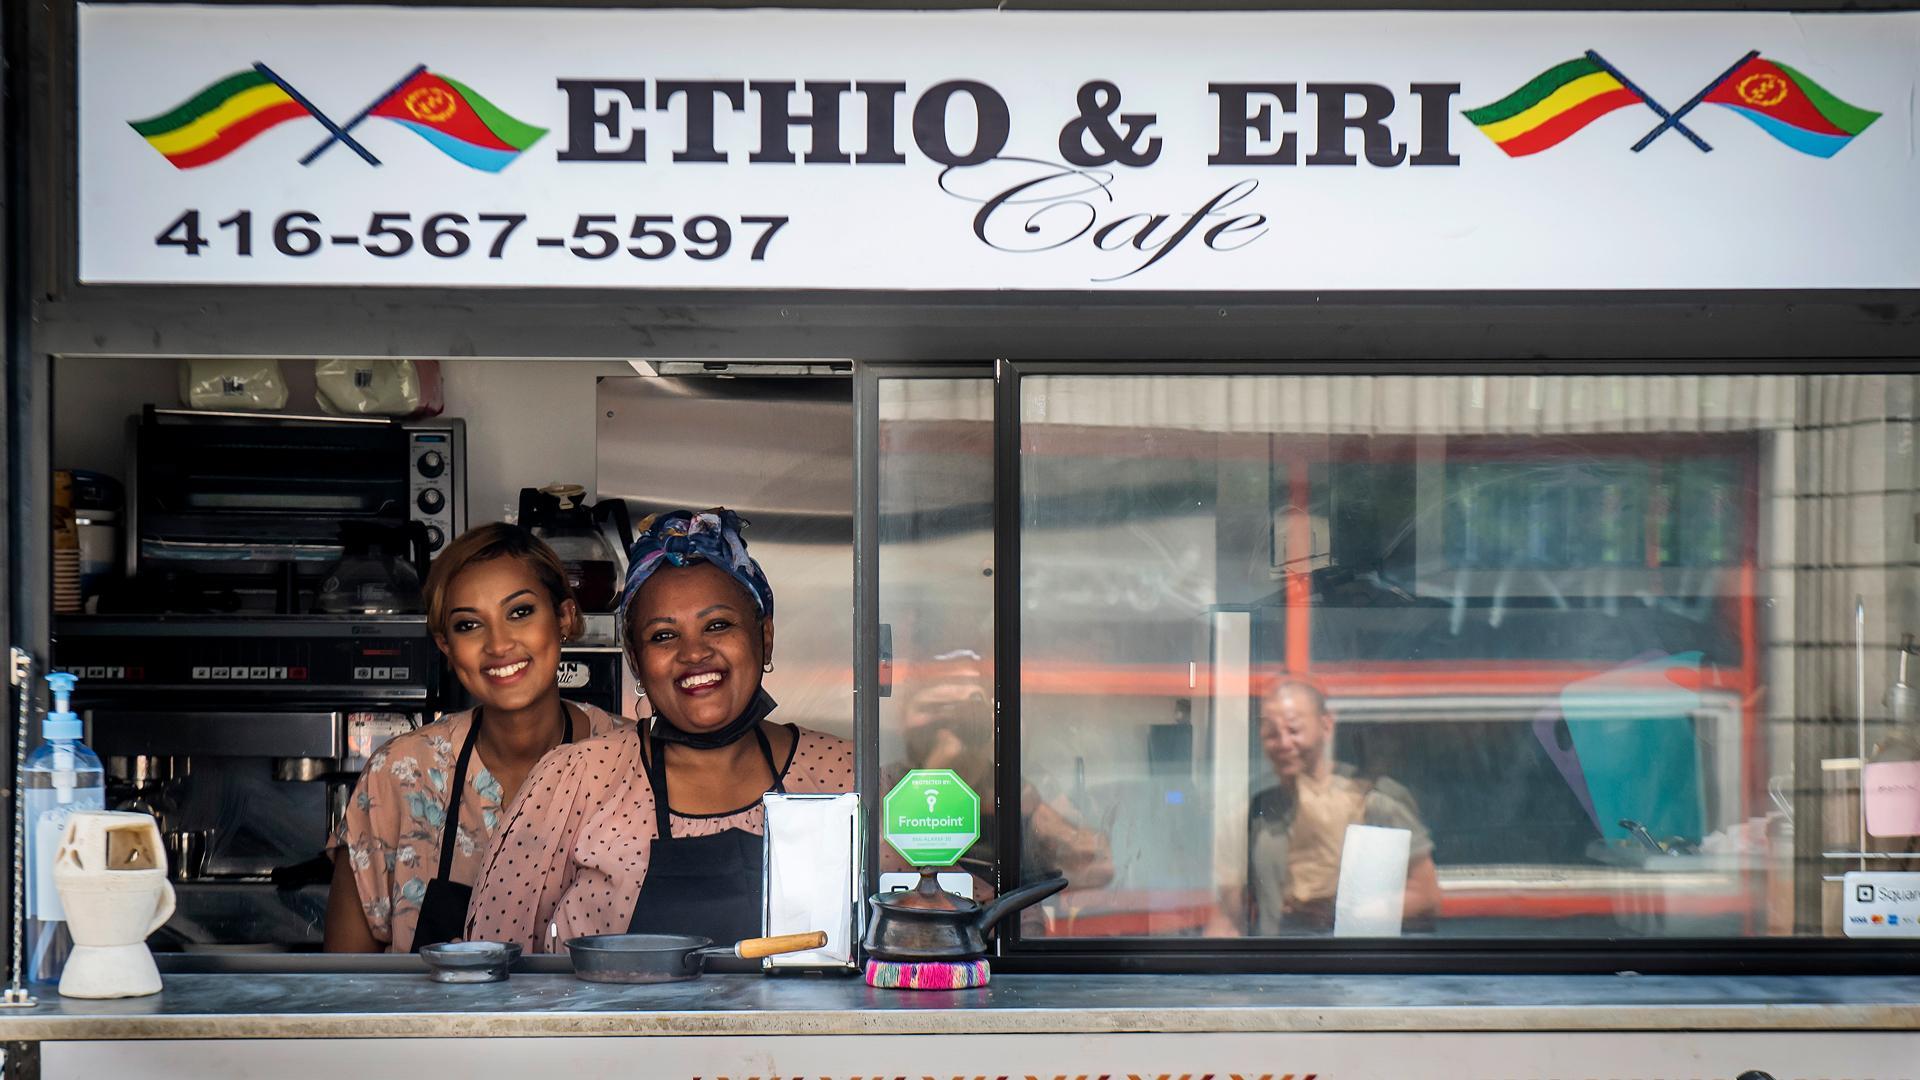 The best Toronto food markets   Ethio & Eri Cafe serves authentic Ethiopian and Eritrean dishes at Market 707